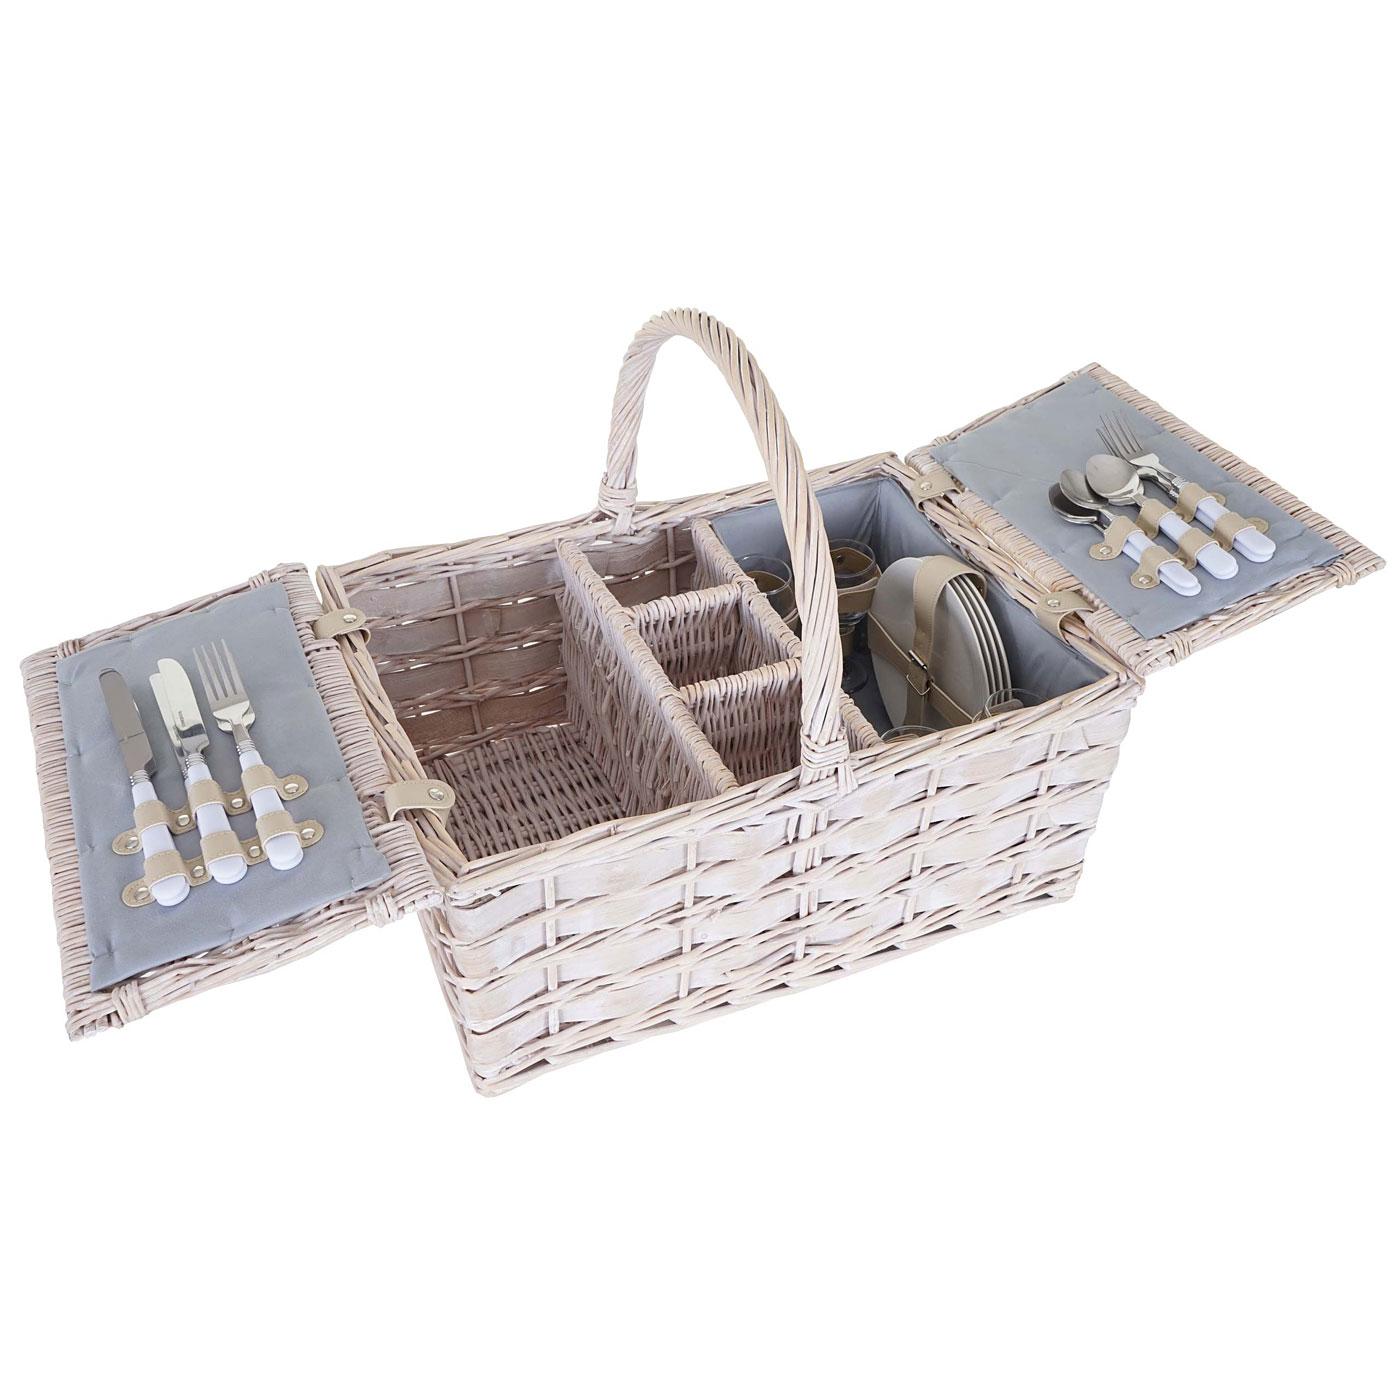 Mendler Picknickkorb-Set HWC-B12 für 4 Personen, Weiden-Korb, Porzellan Glas Edelstahl, grau ~ Variantenange 60058